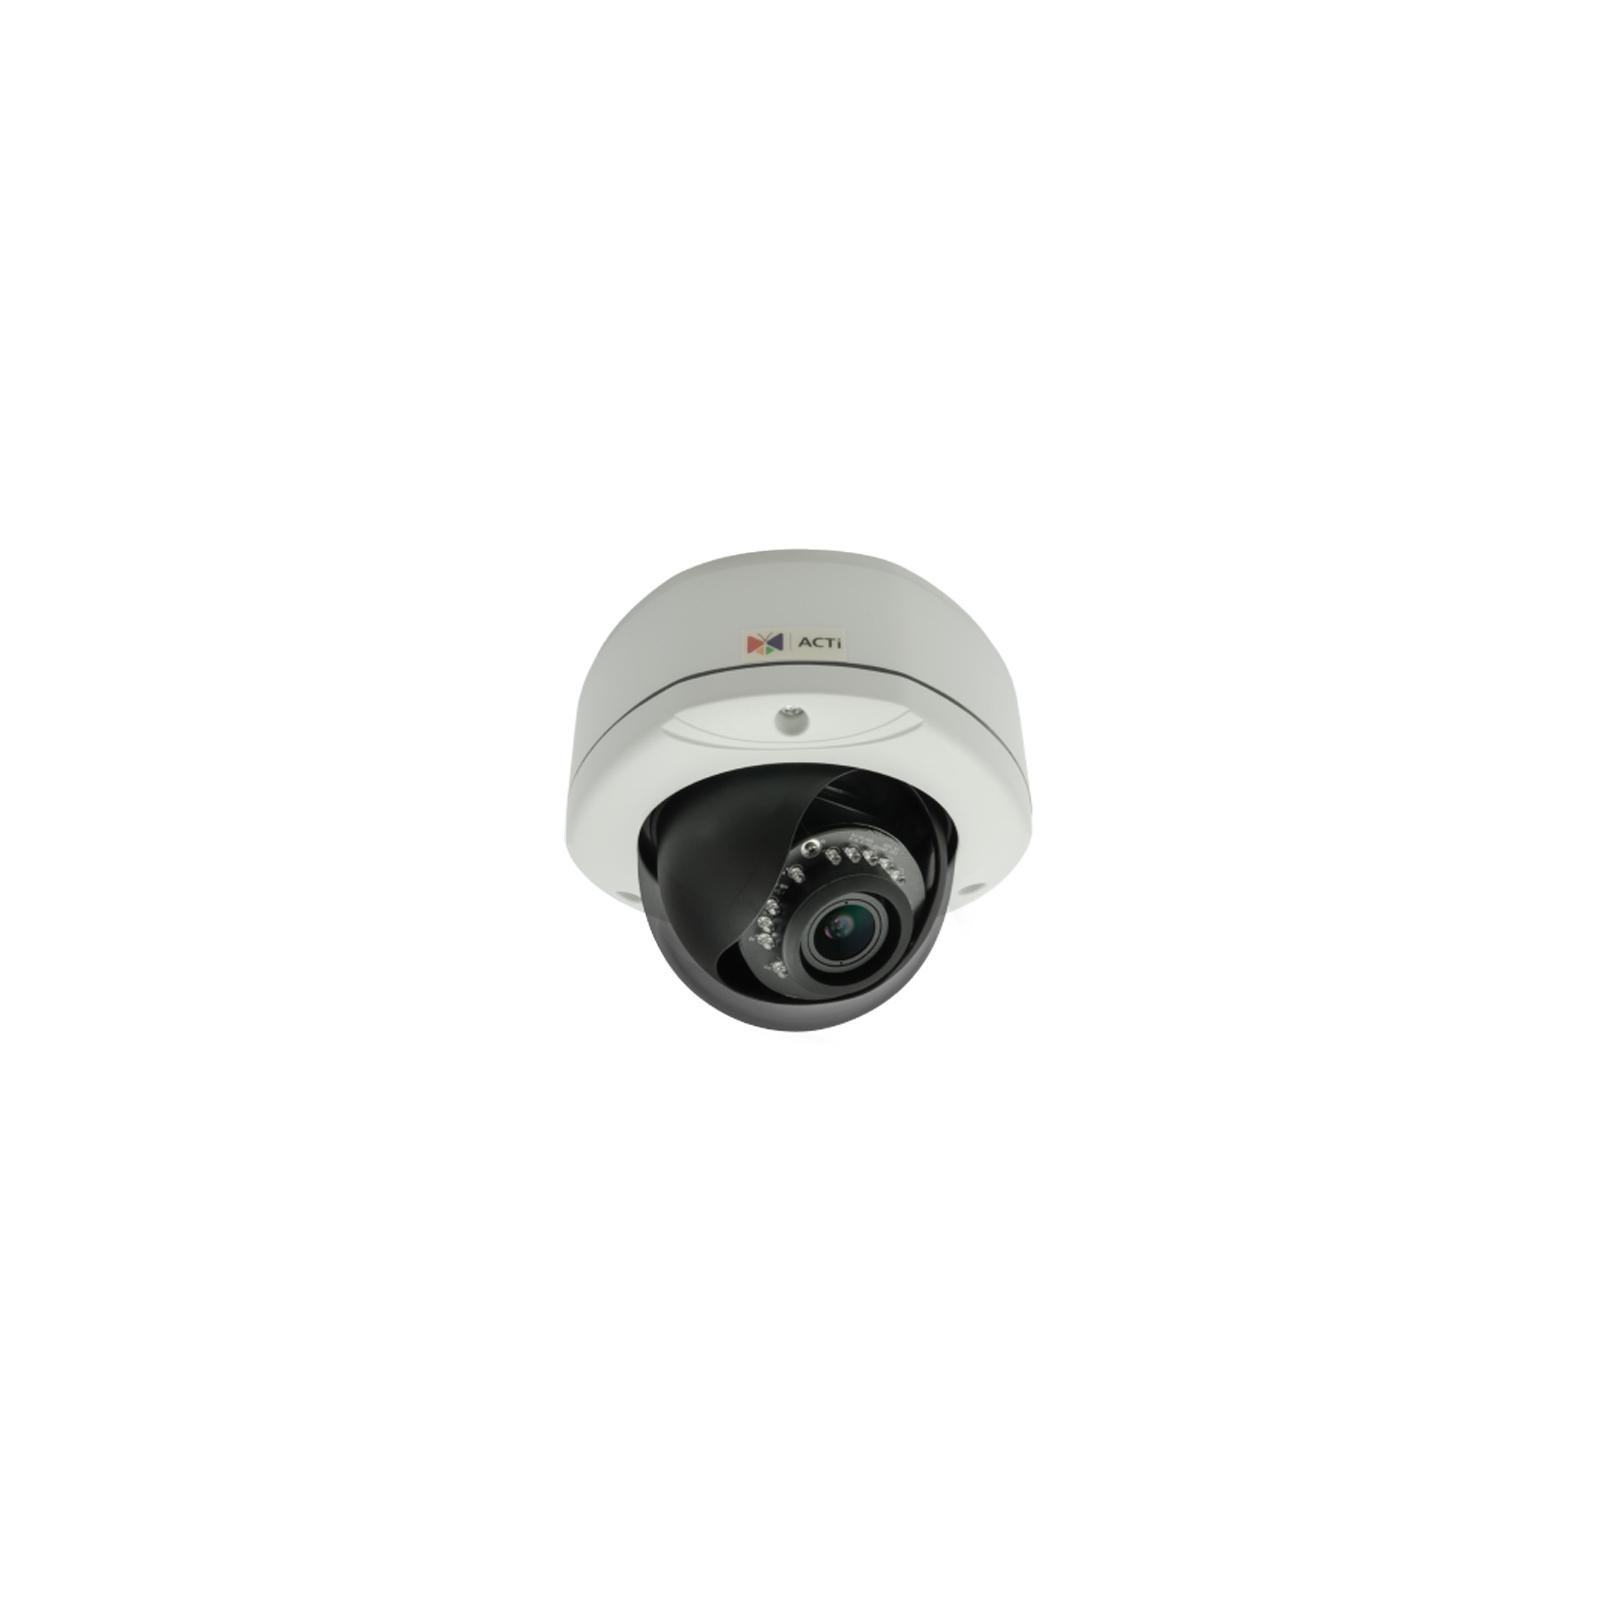 Камера видеонаблюдения ACTi E83A